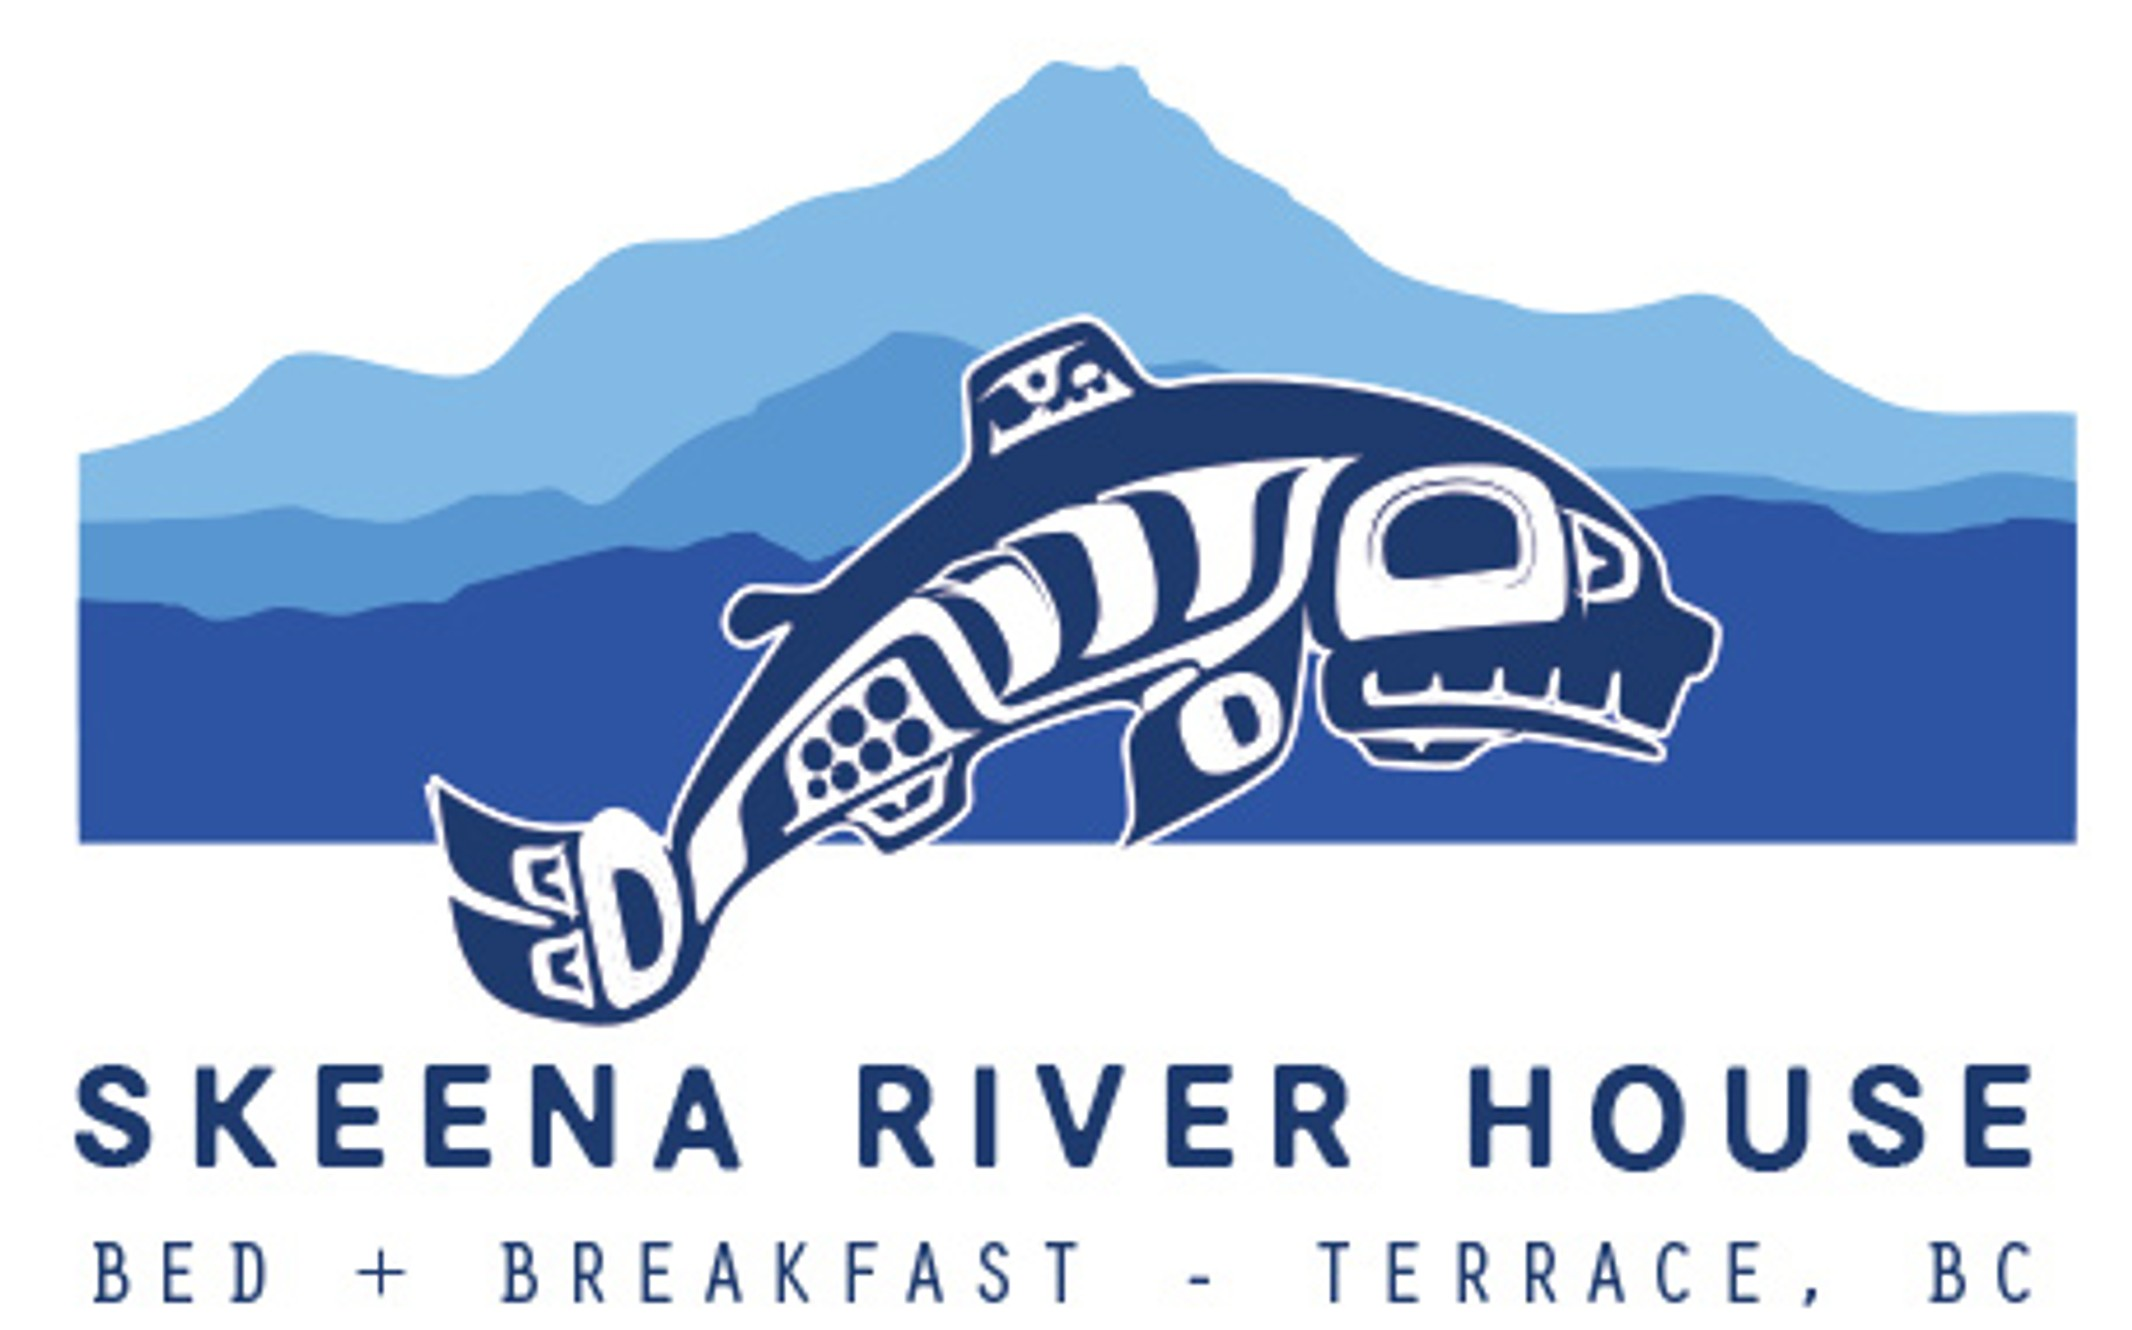 Skeena River House Bed & Breakfast logo